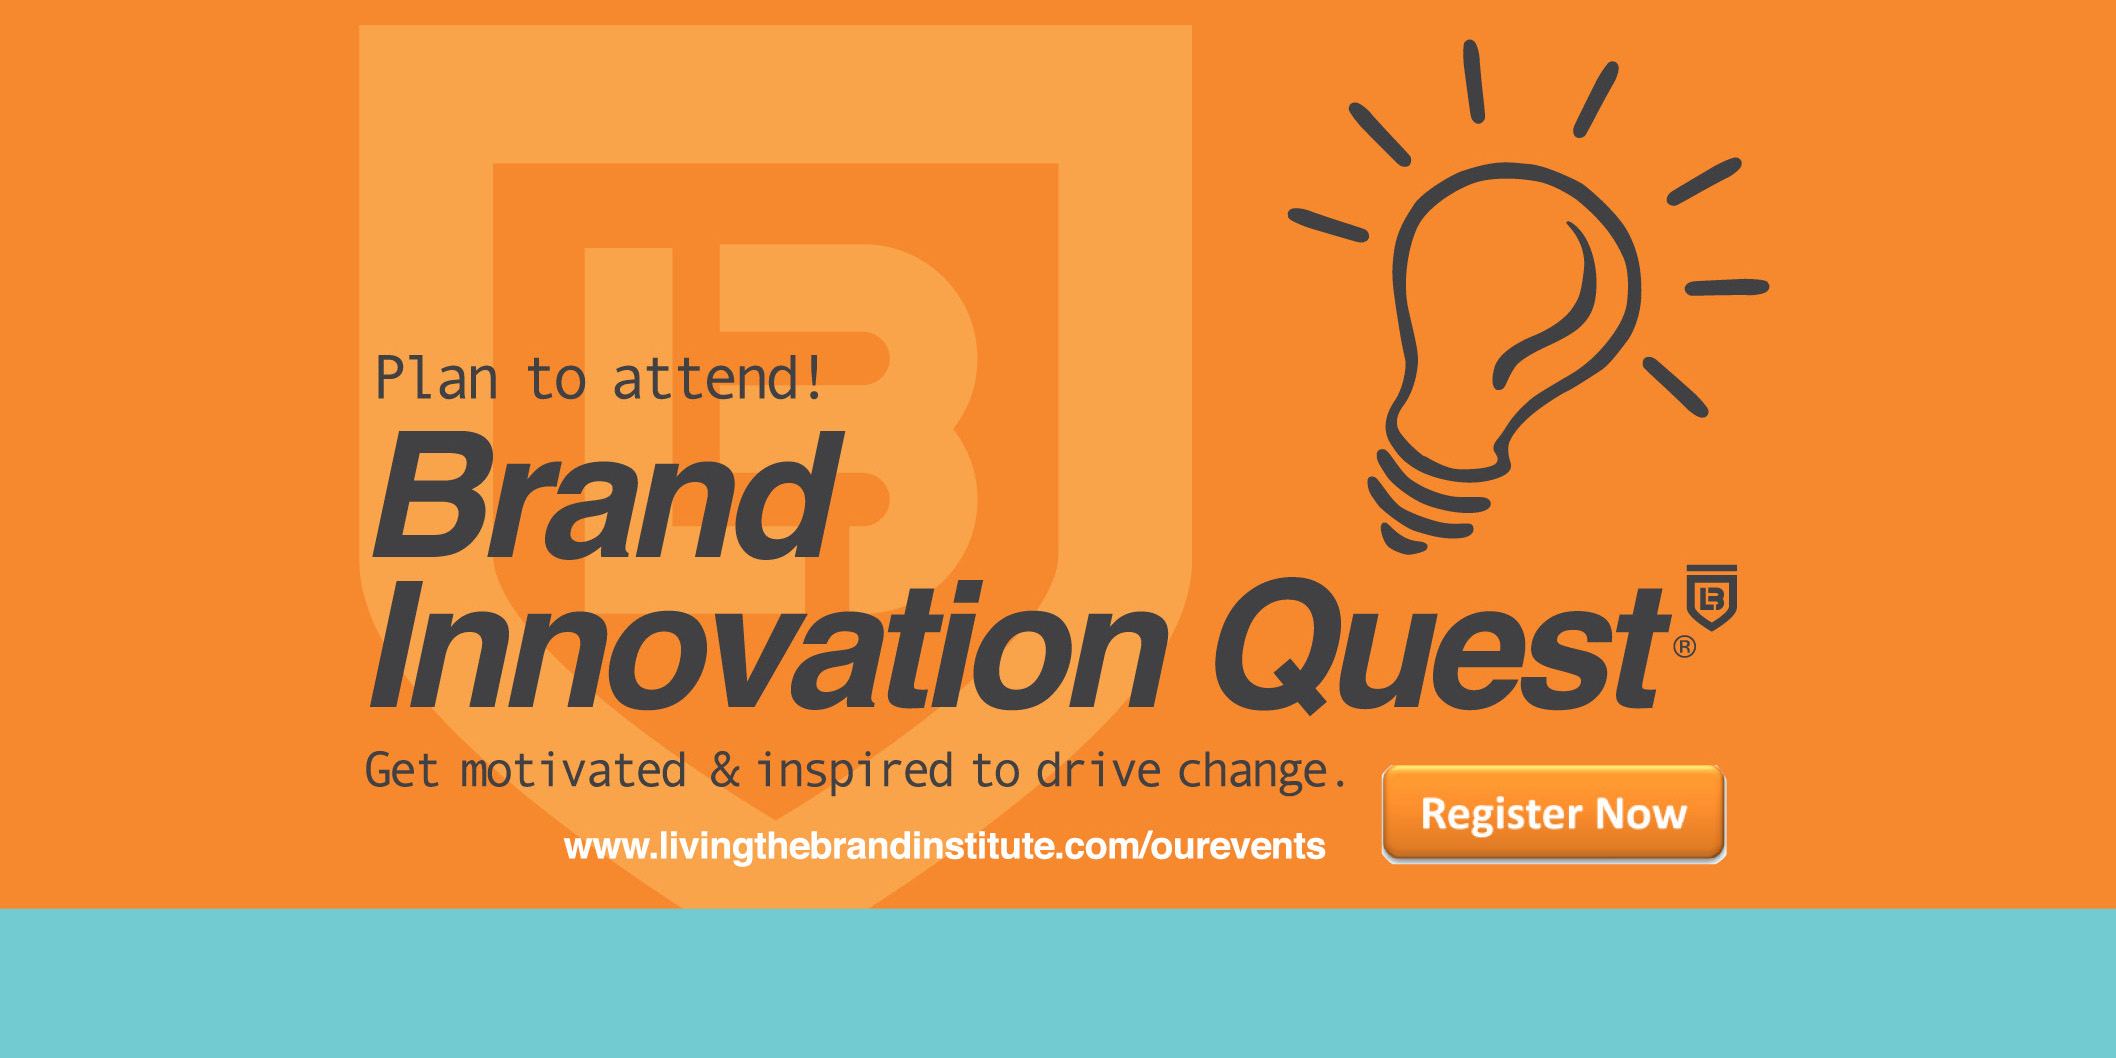 Brand Innovation Quest